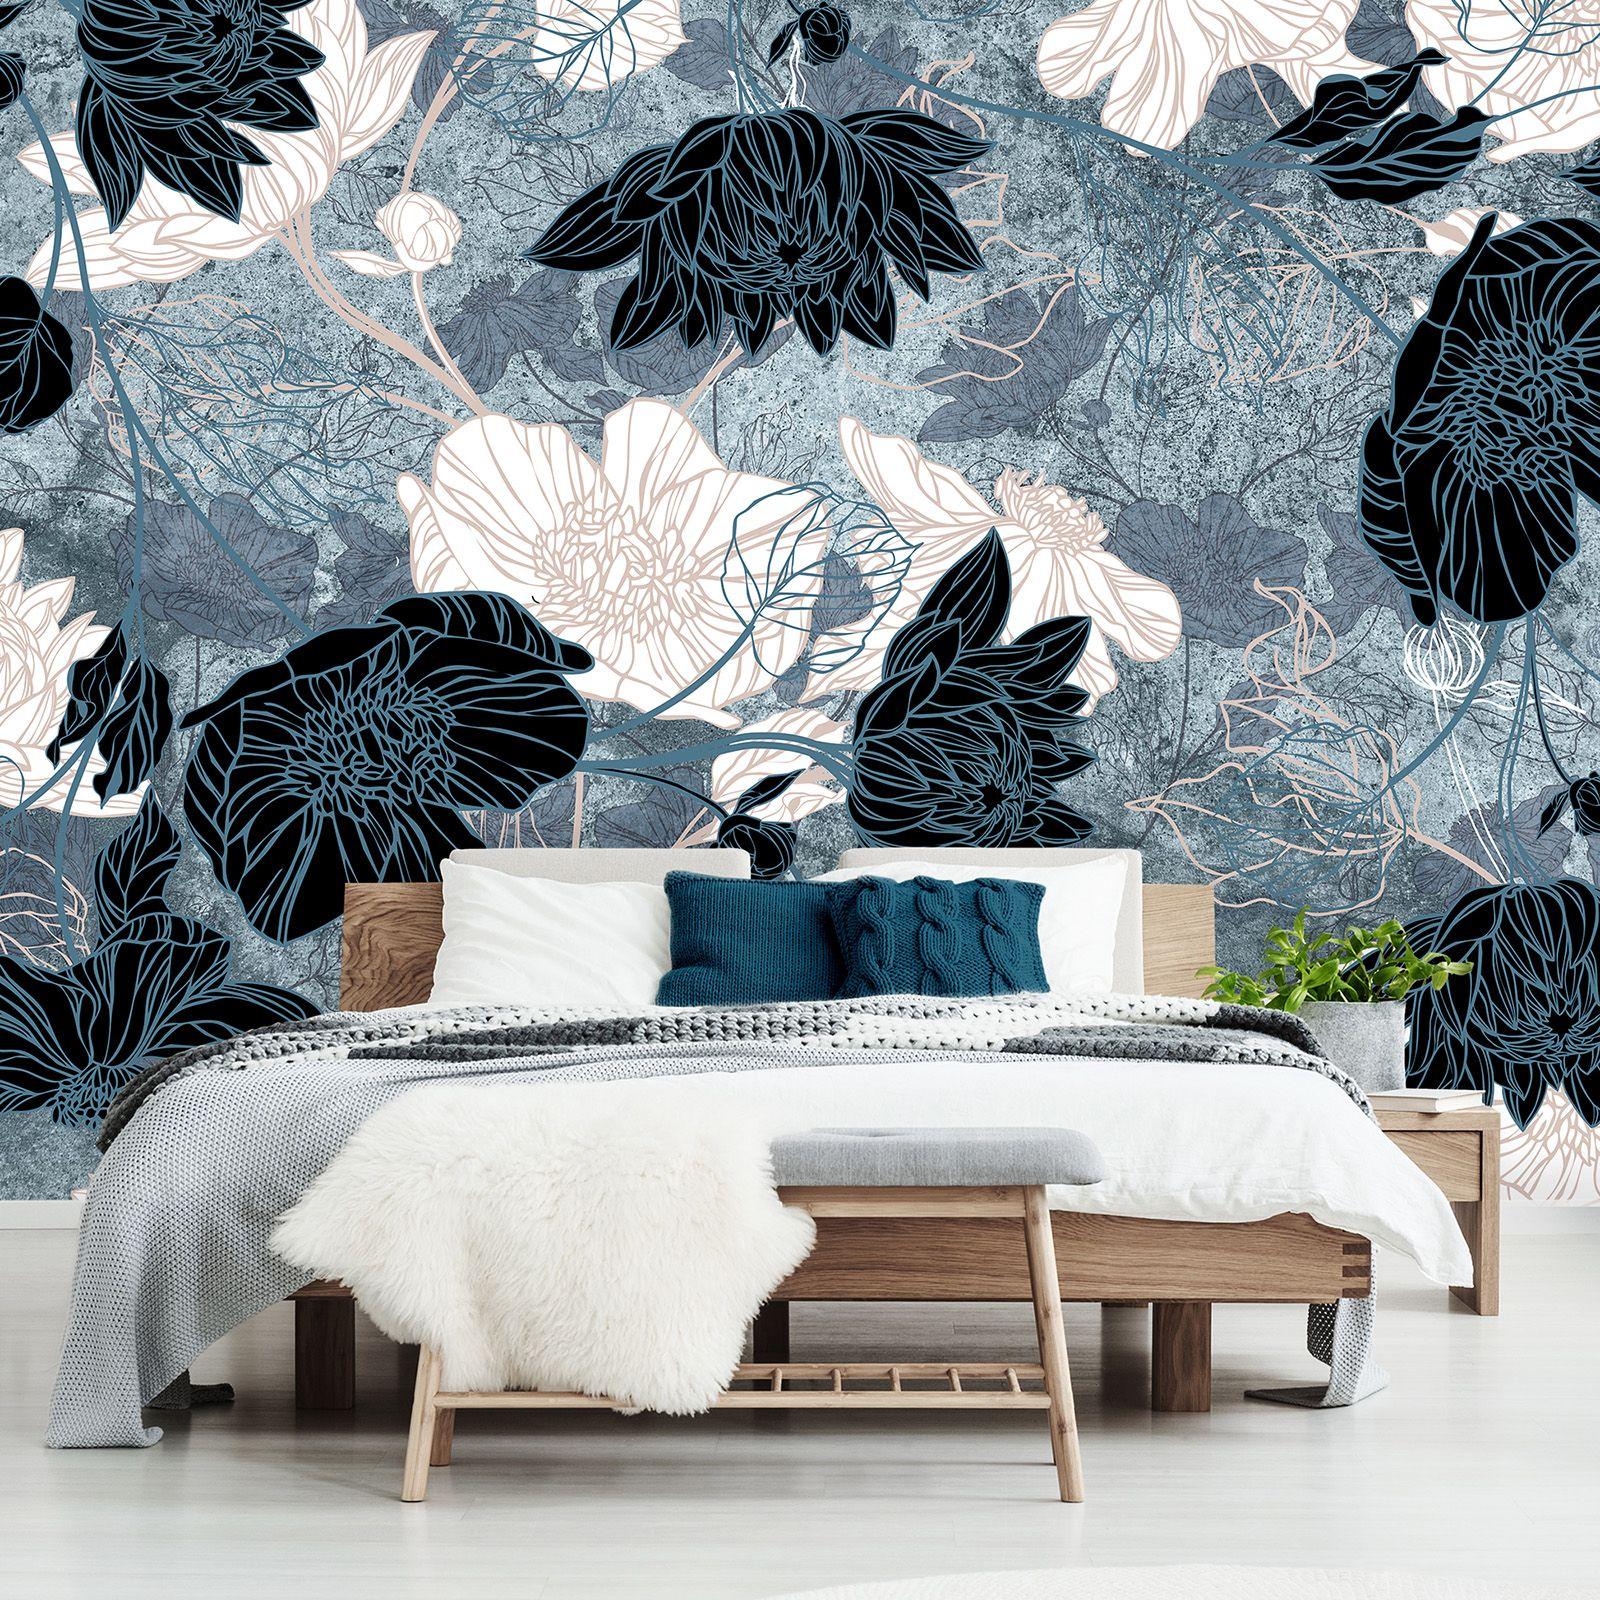 Floral Wallpaper Flowers On Wall Floral Print Mural Interior Design Wallpaper Self Adhesive Wal Photo Mural Wall Wallpaper Interior Design Floral Wallpaper